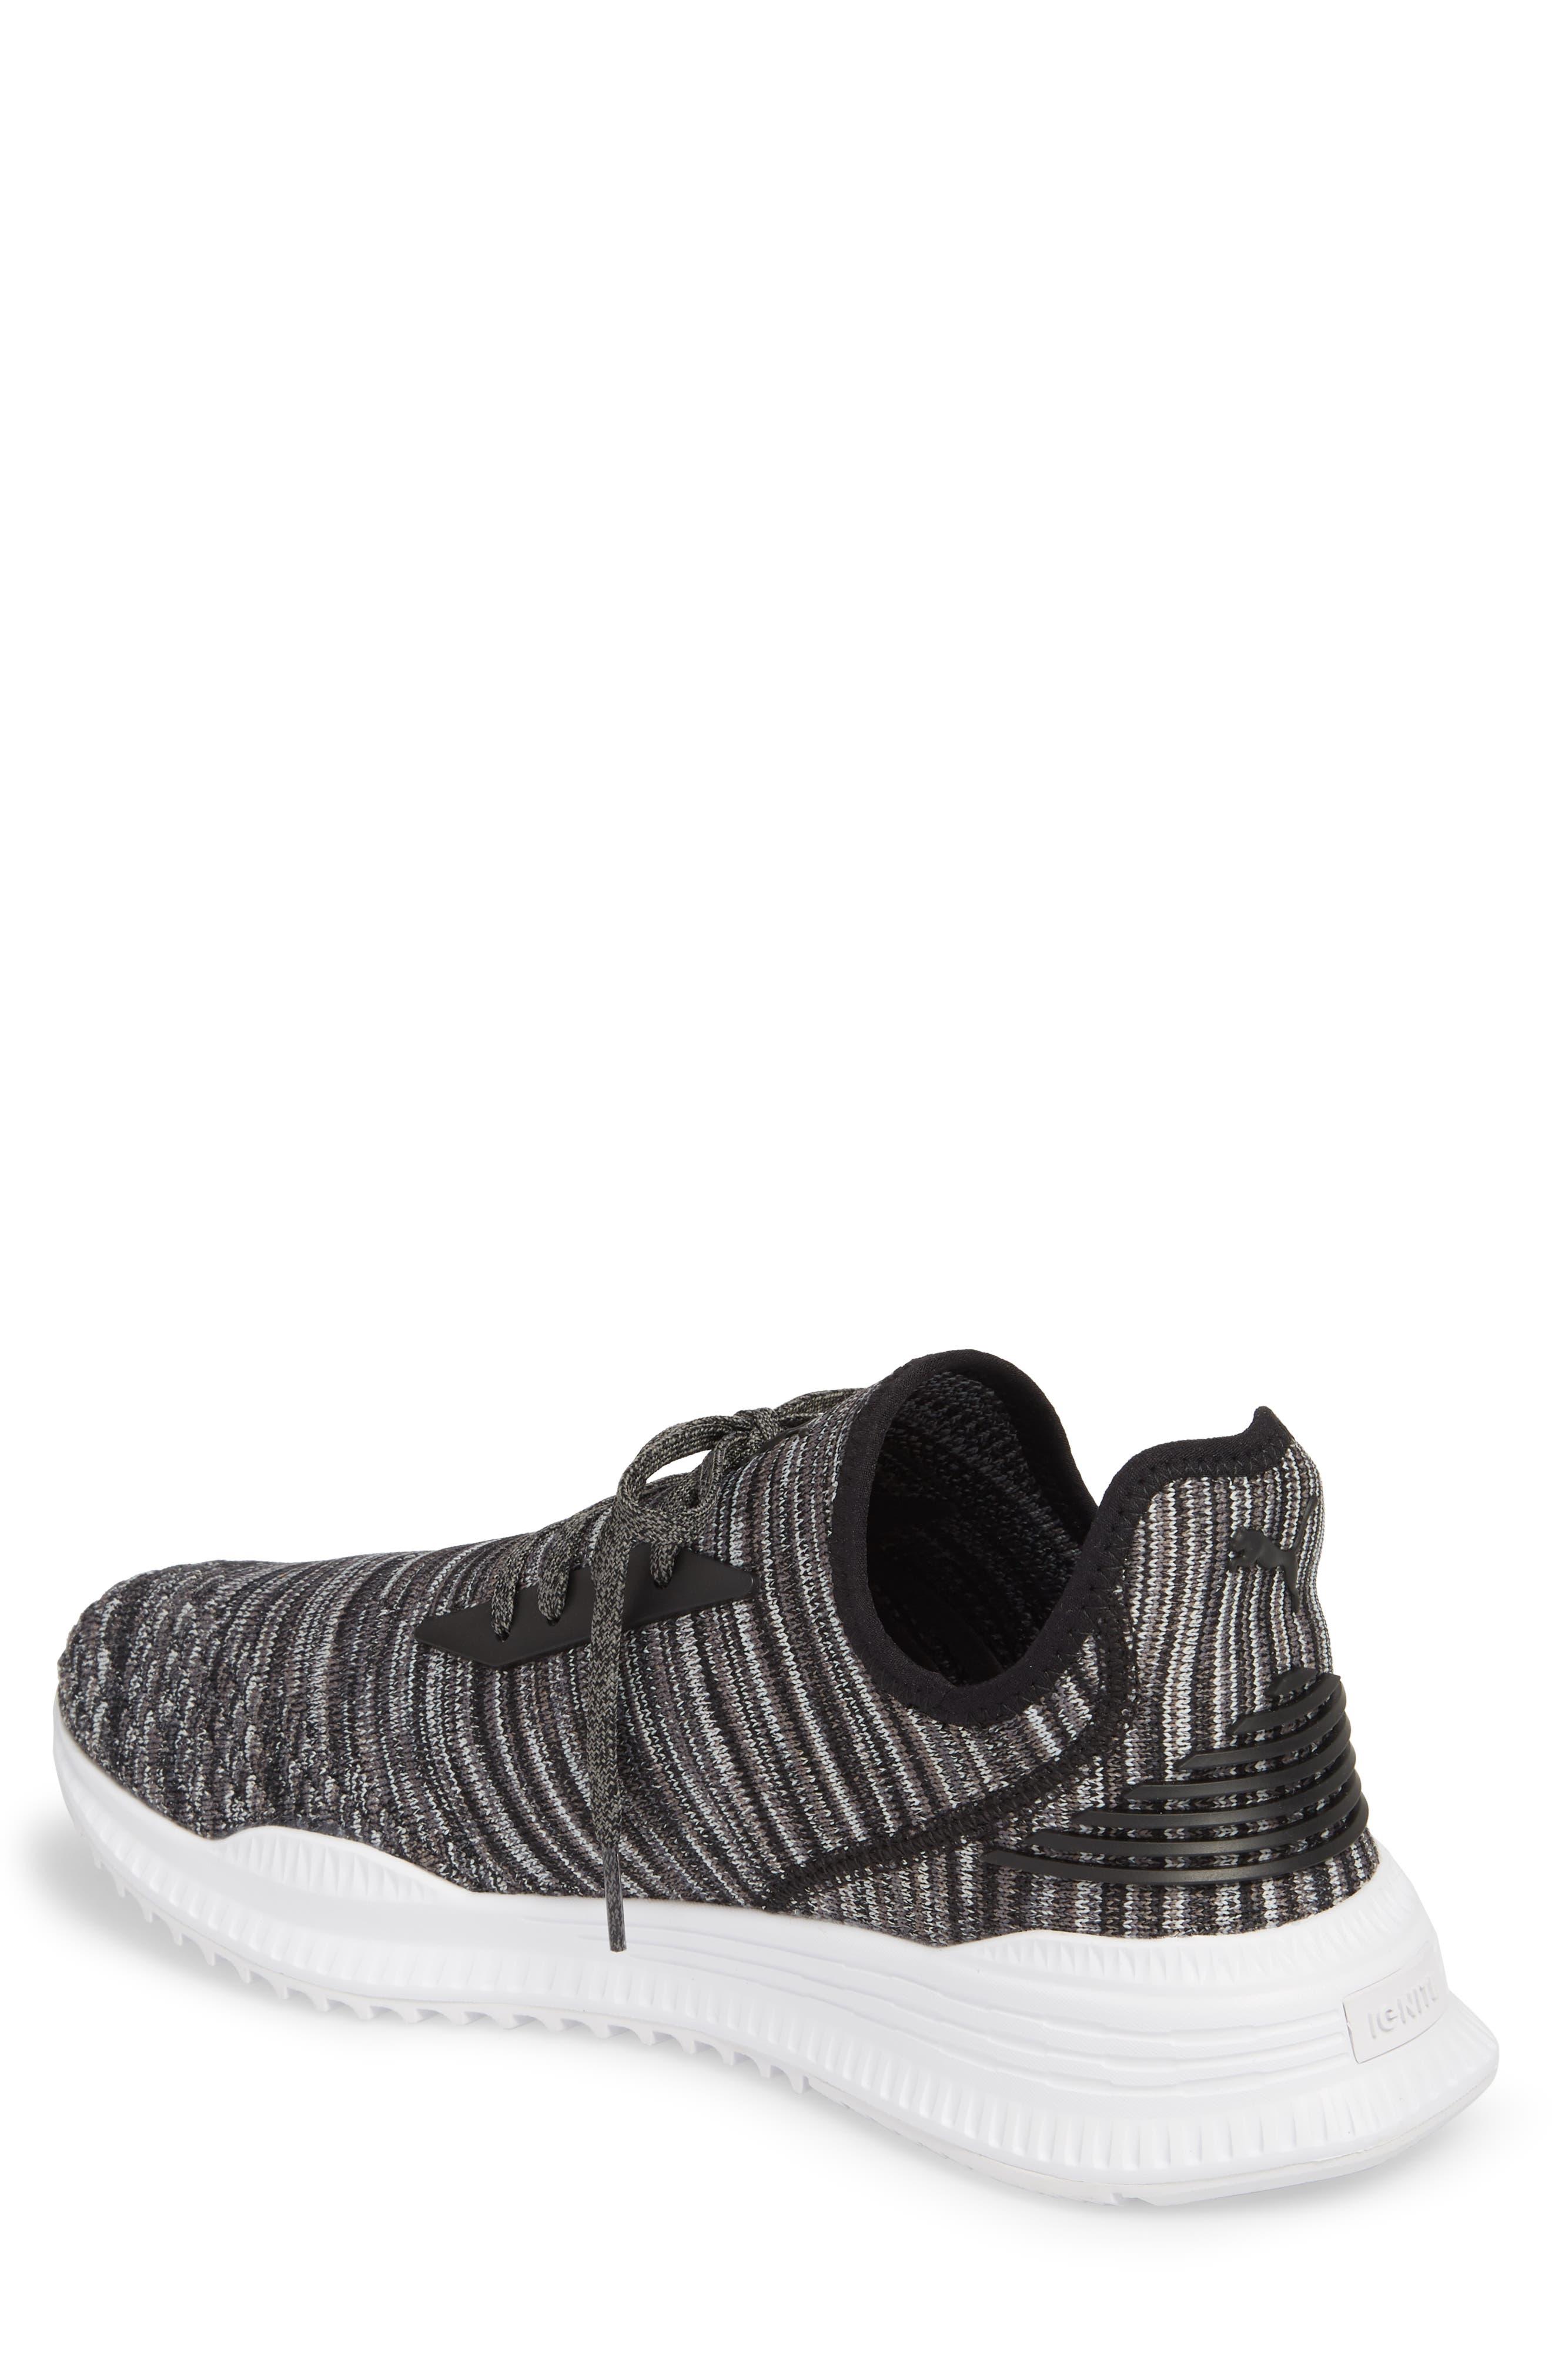 Tsugi 90 Sneaker,                             Alternate thumbnail 2, color,